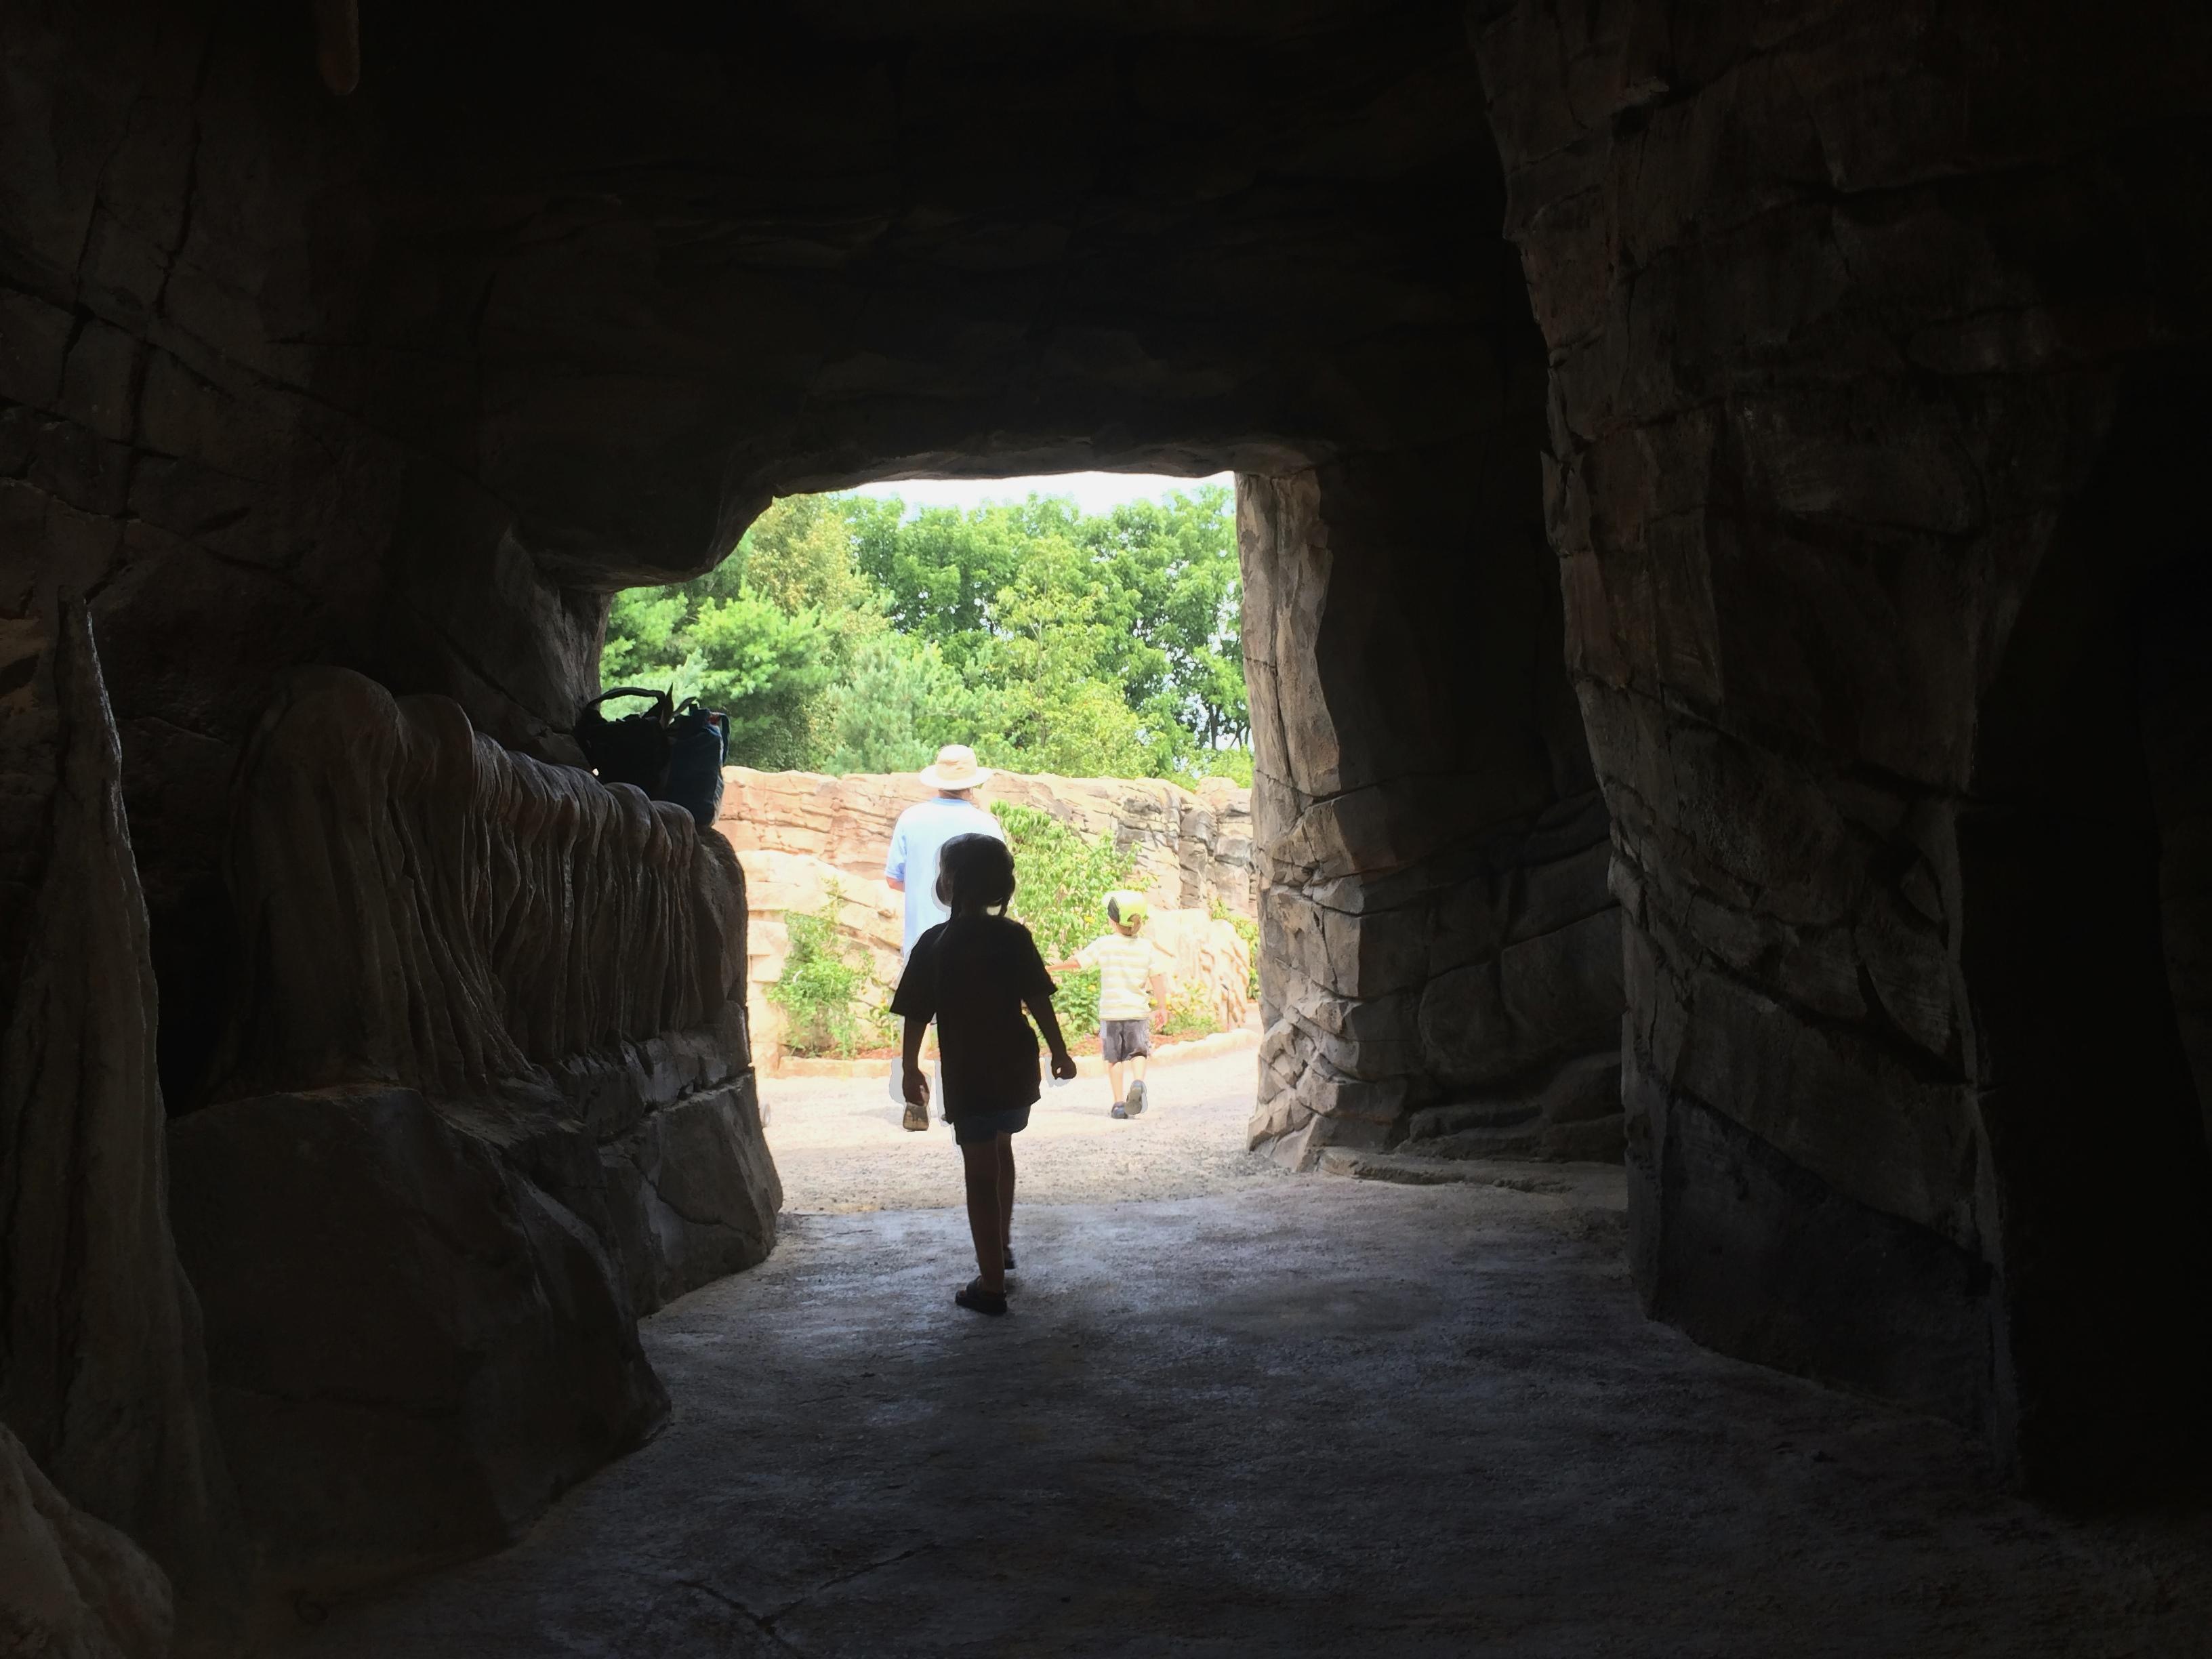 Child Going Through Cave